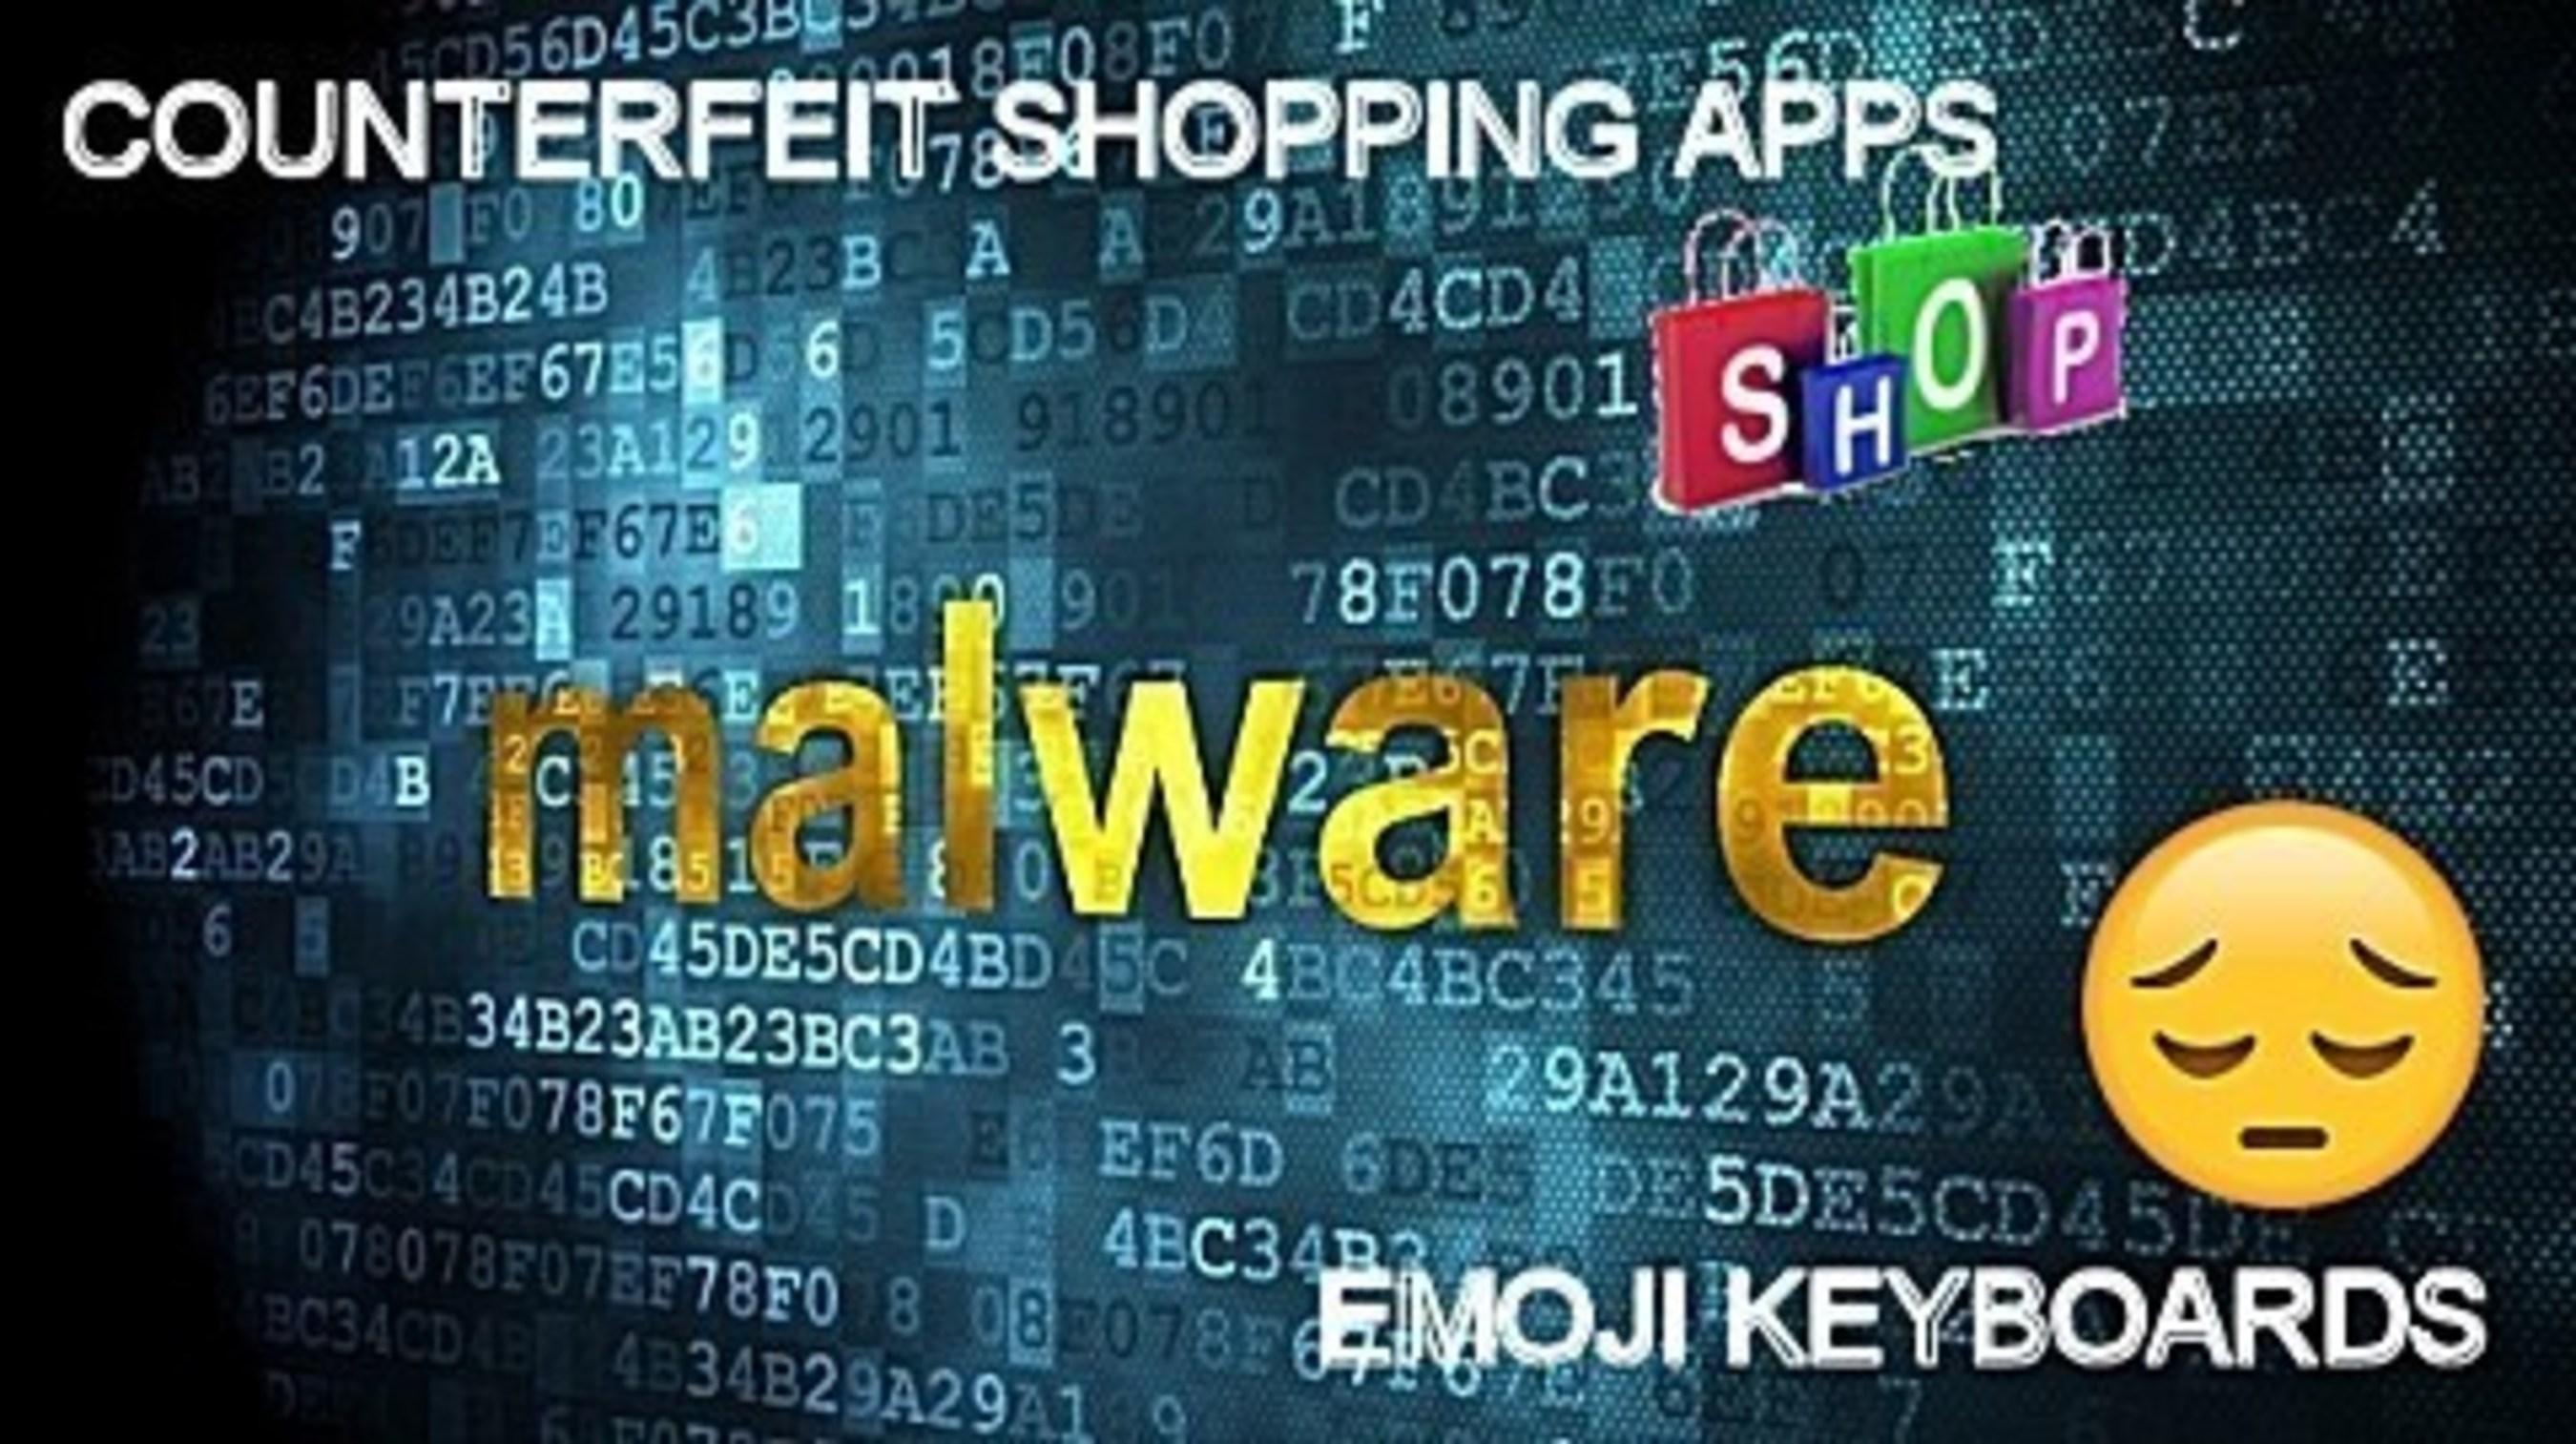 Emoji Keyboard Malware and Counterfeit Shopping Apps